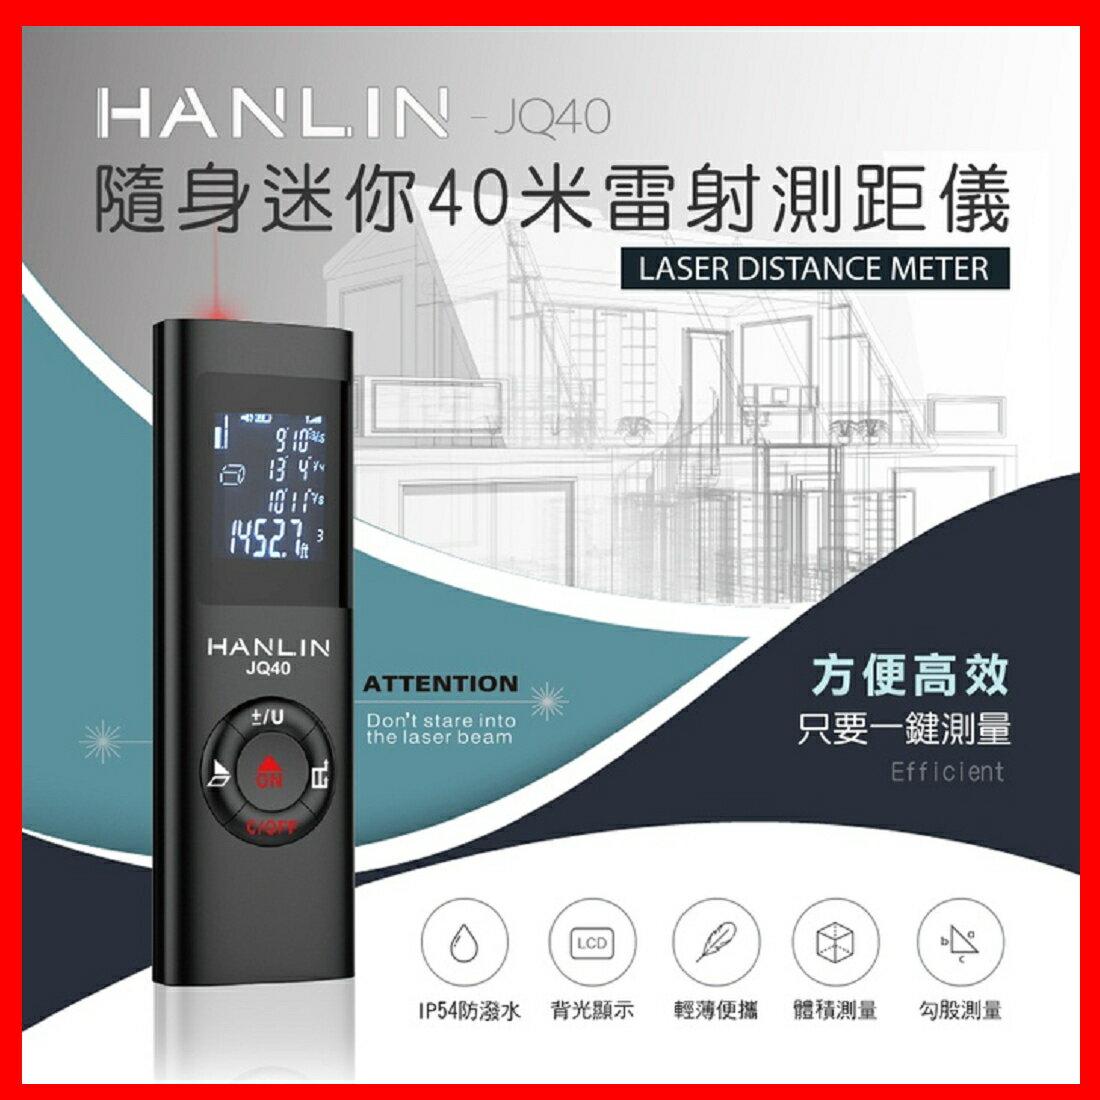 HANLIN~JQ40 超薄 防塵防潑水 40米房仲 迷你雷射測距儀 距離測量儀 雷射尺